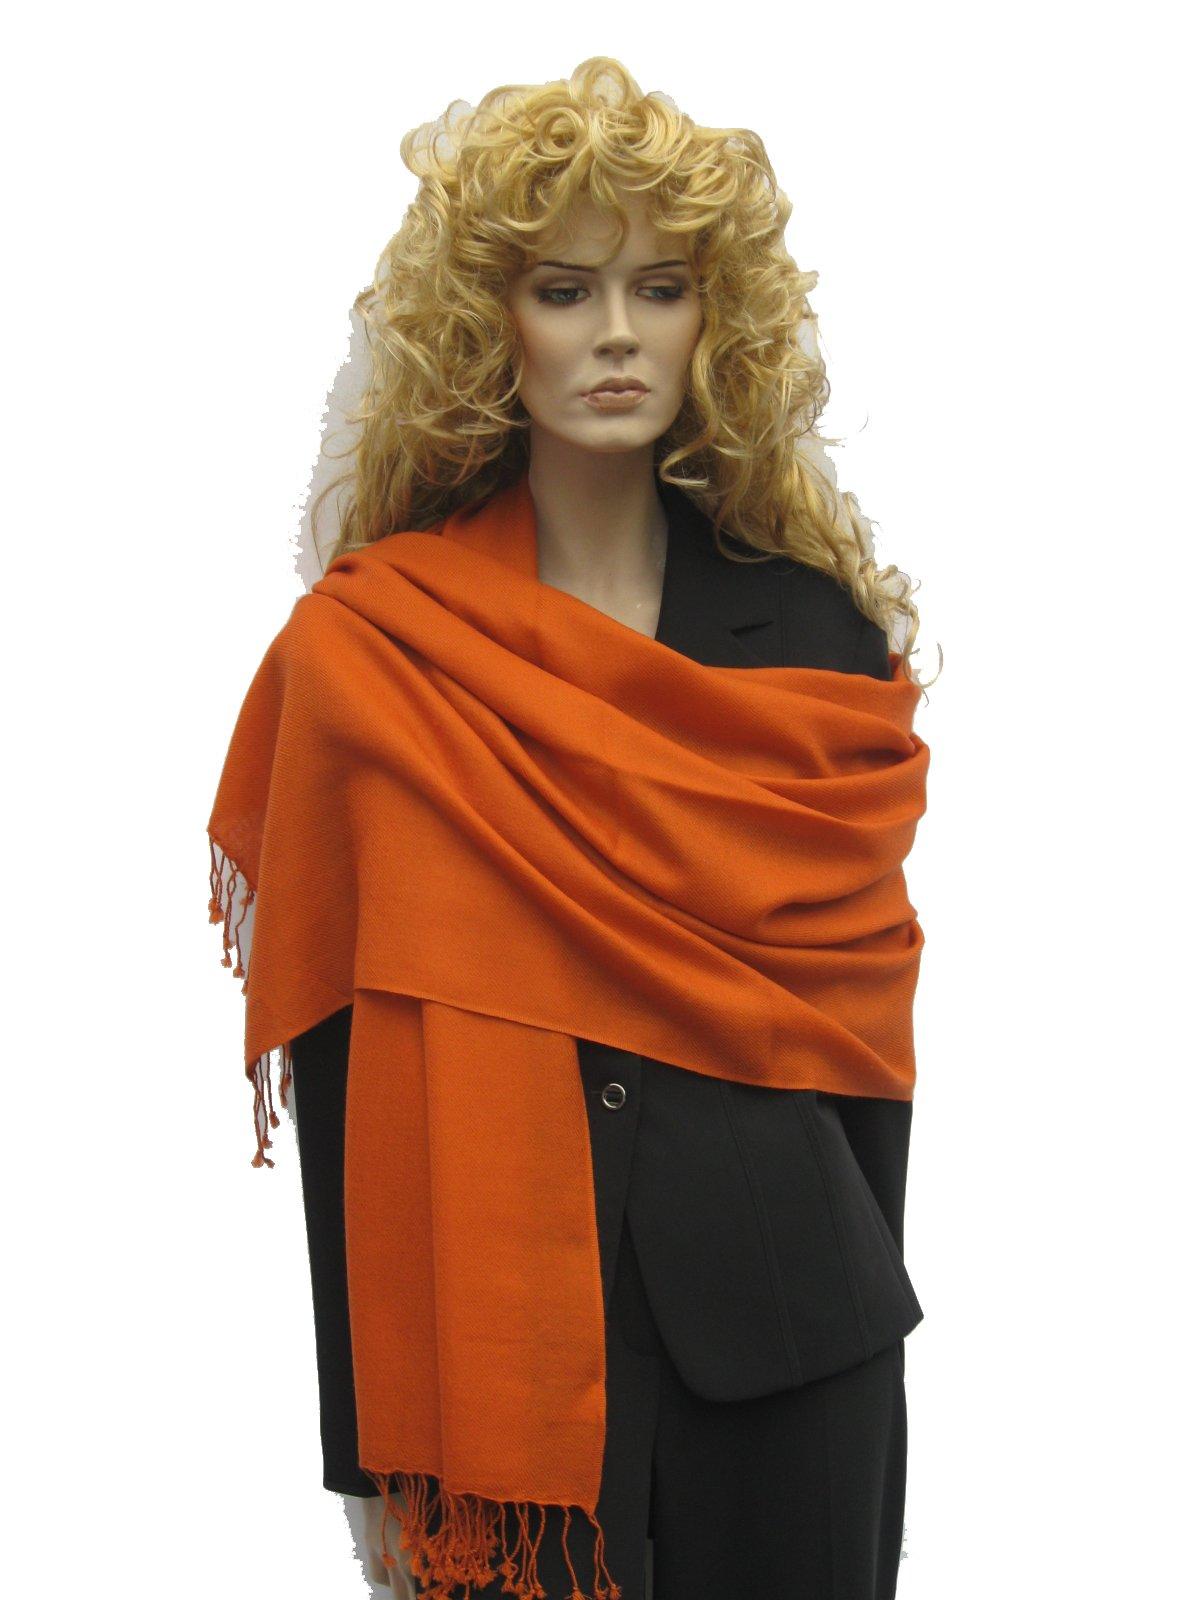 Pashmina scarf, shawl, wrap (2 Ply Pure Pashmina wrap) from Cashmere Pashmina Group (Burnt Orange)